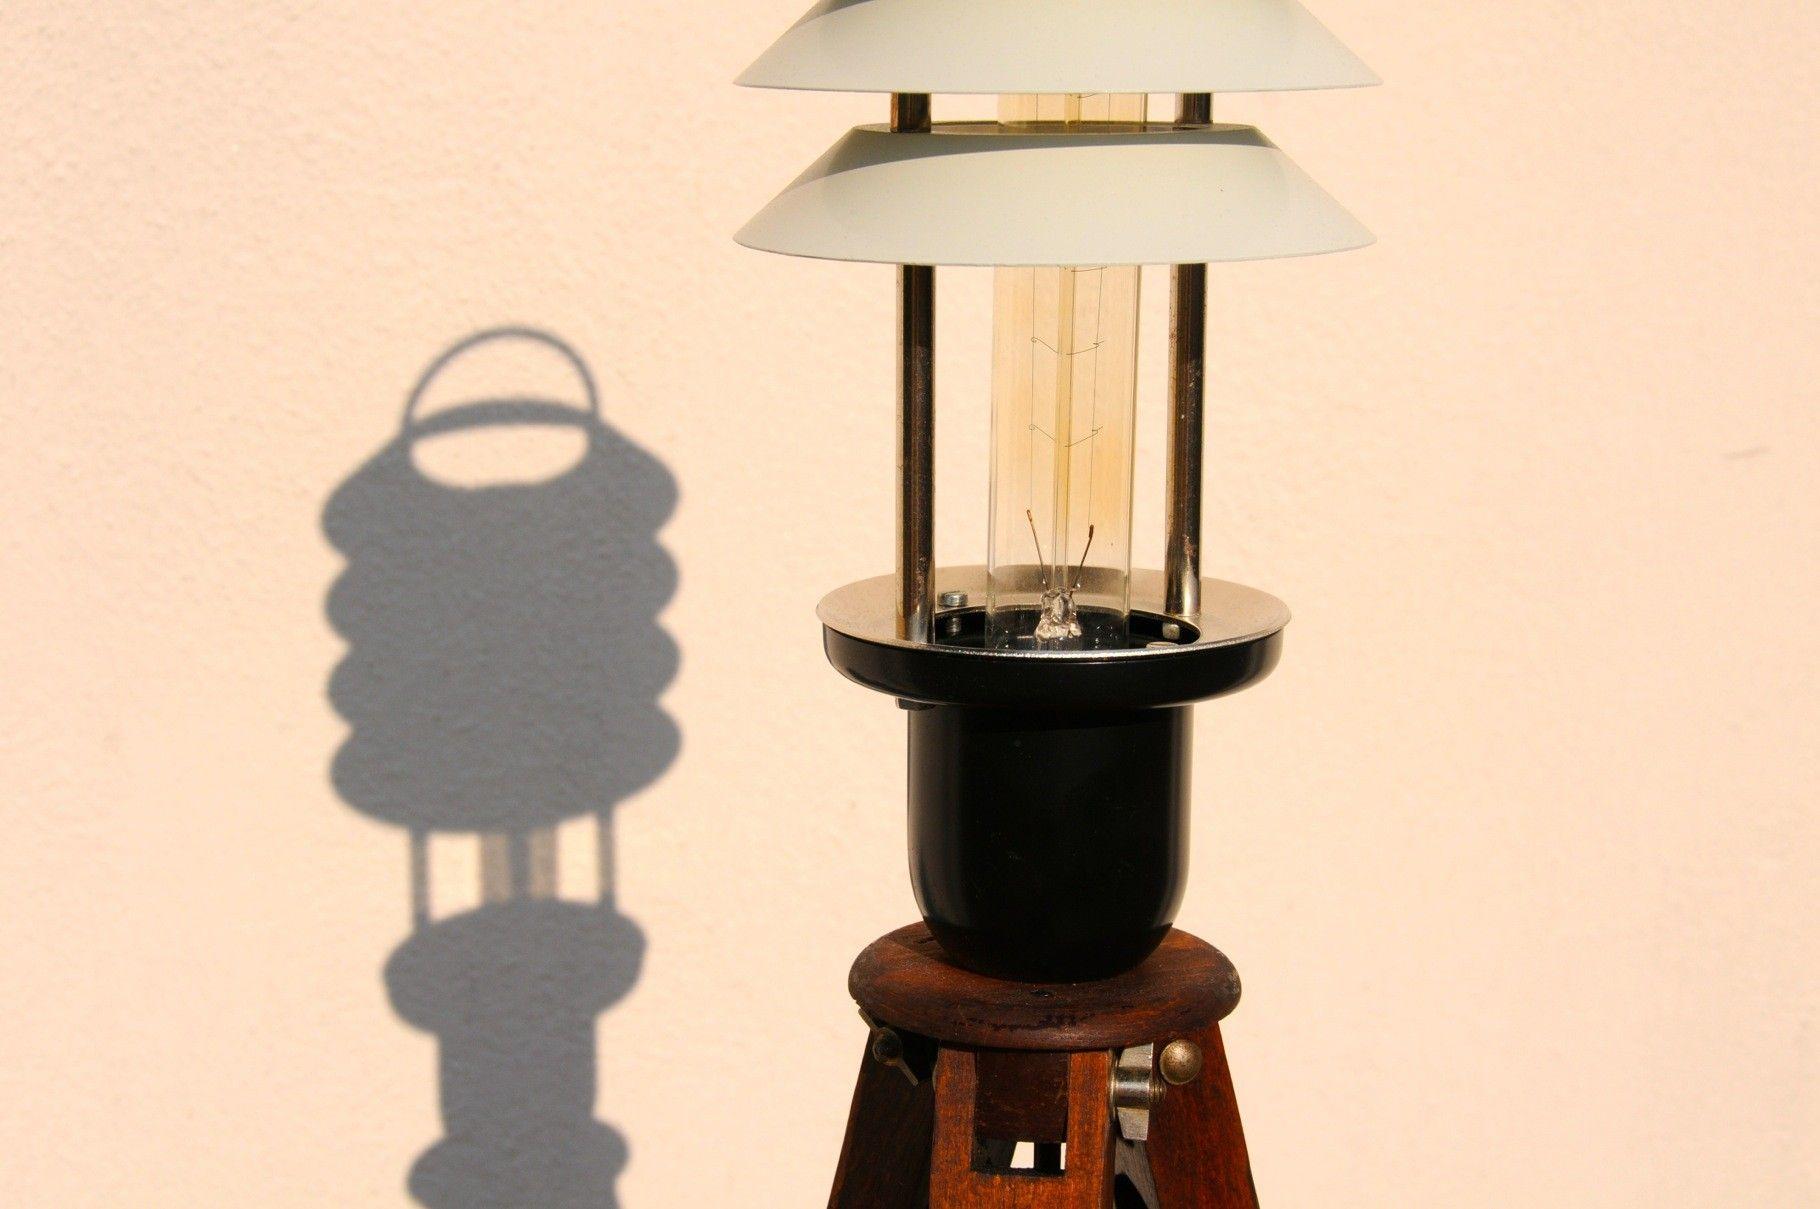 Stehlampe Bauhaus Pagode Stehlampe Led Und Lampen